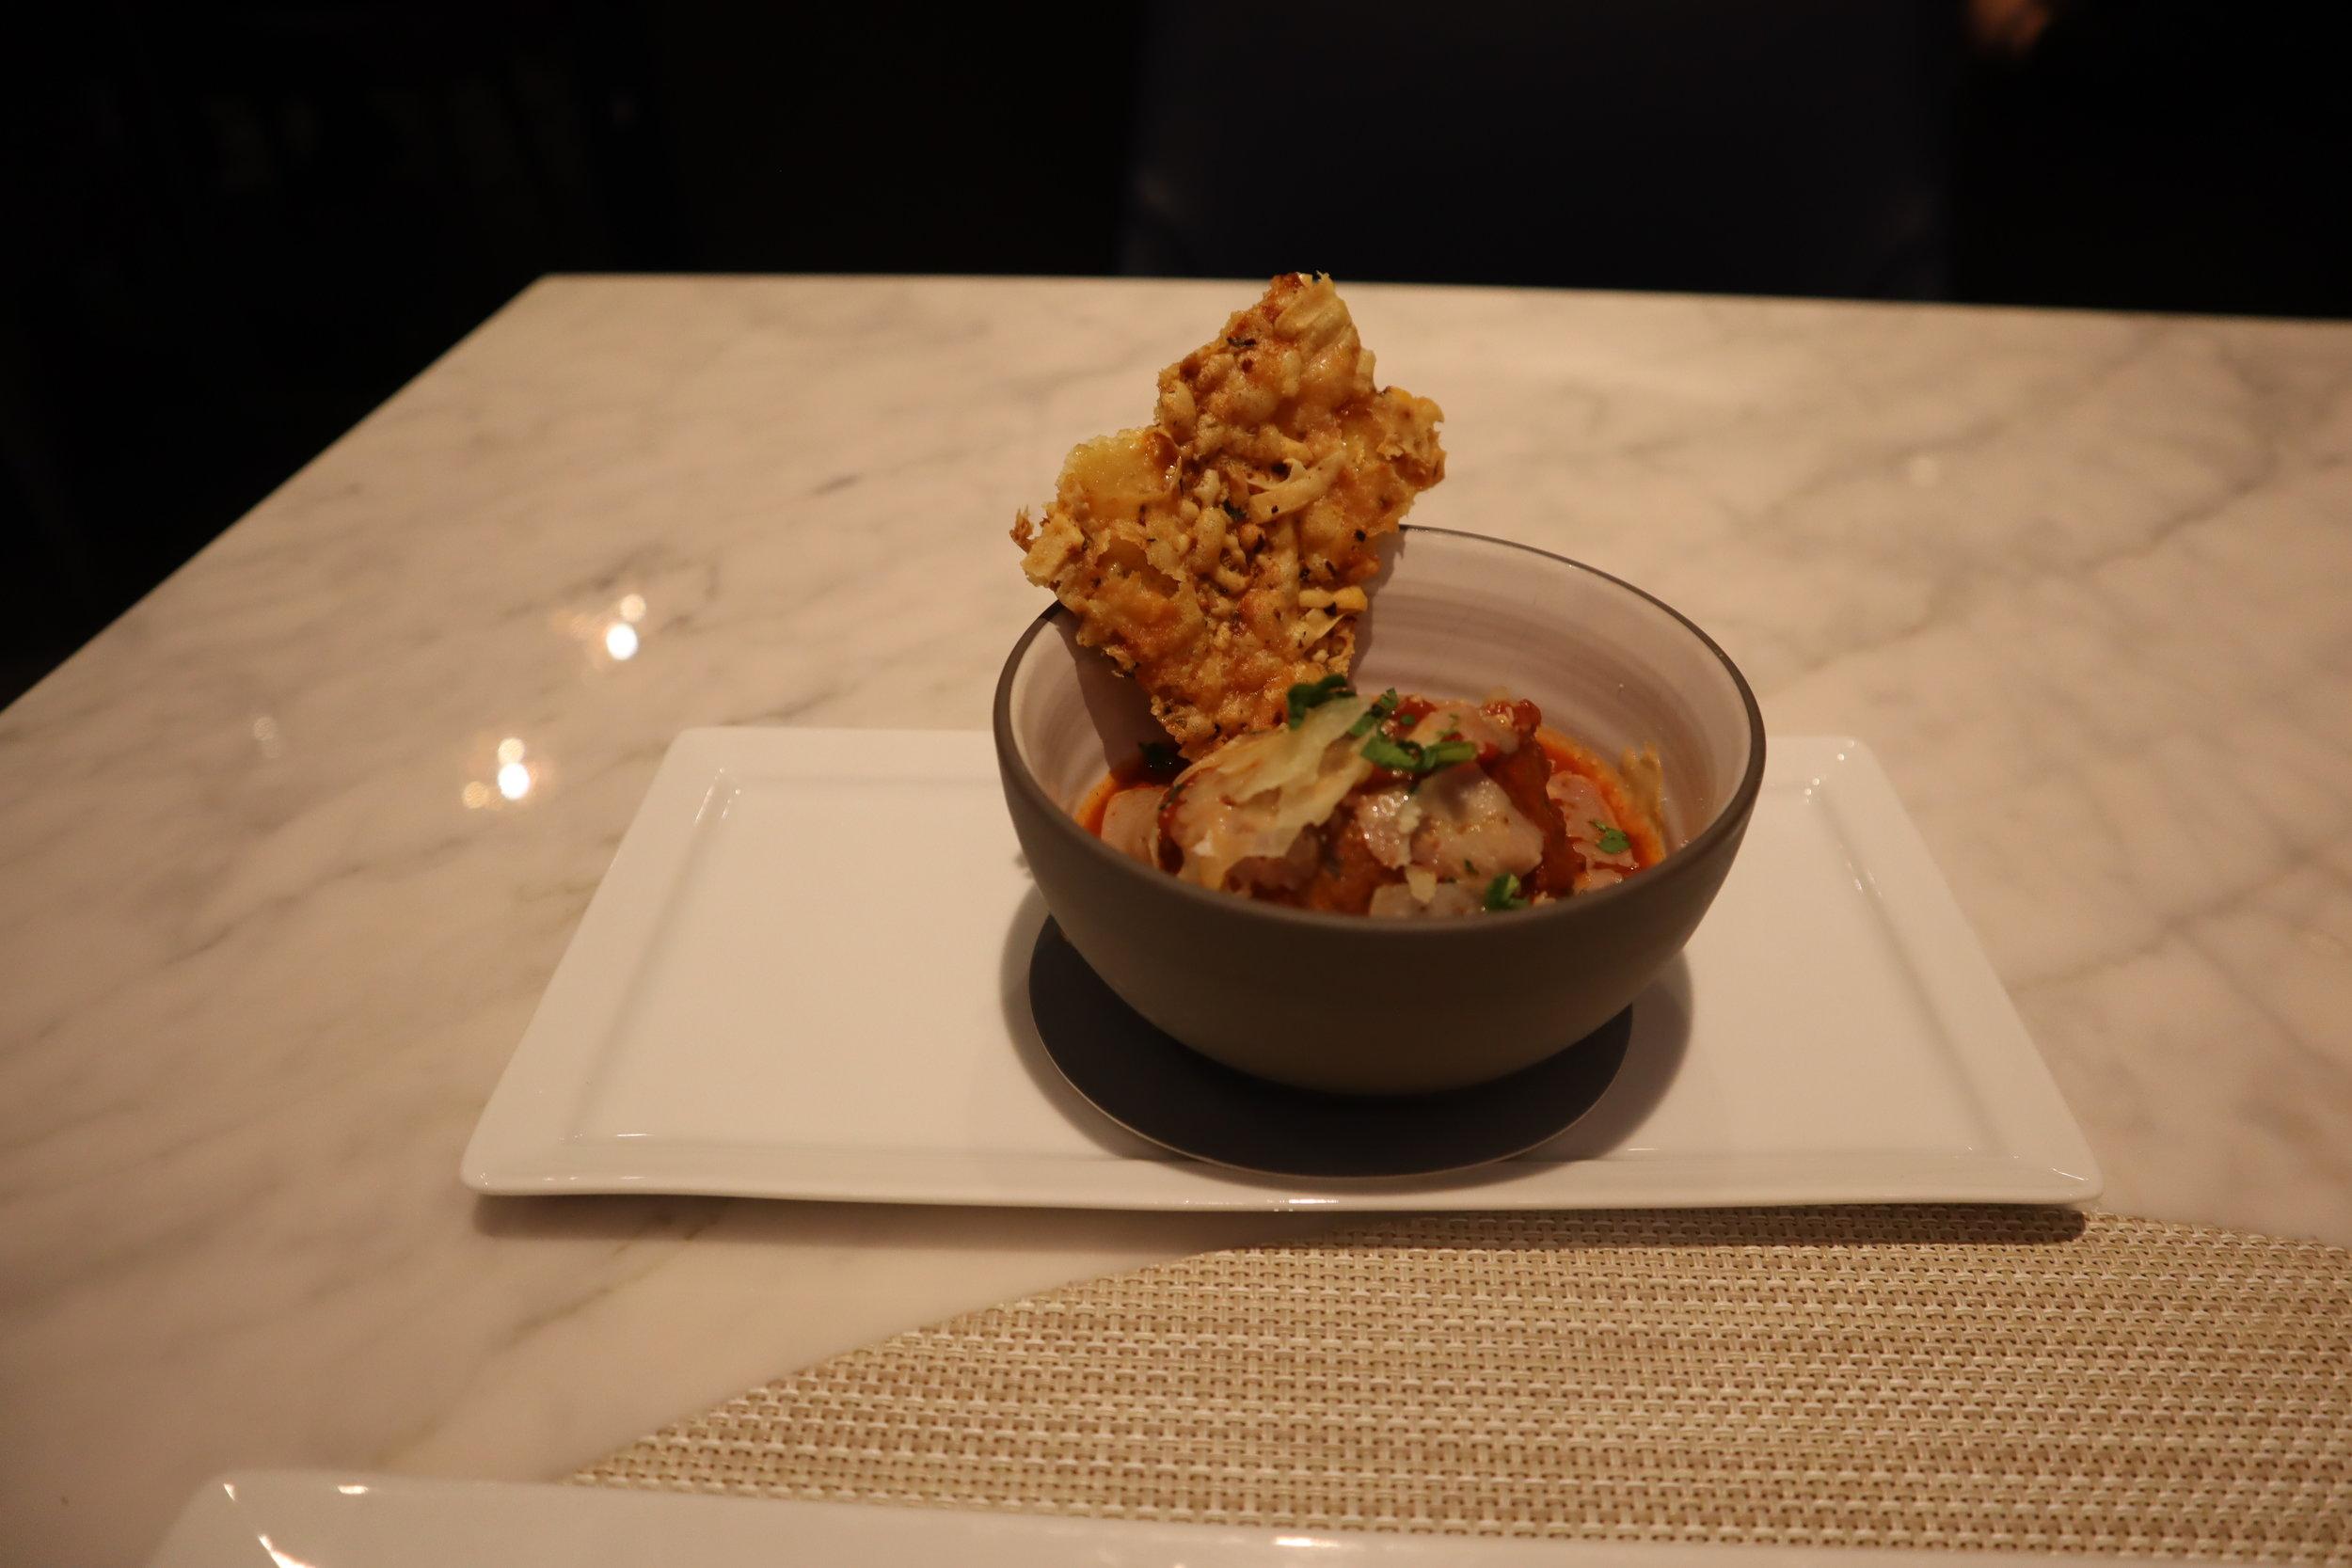 United Polaris Lounge Newark – Slow-cooked meatballs